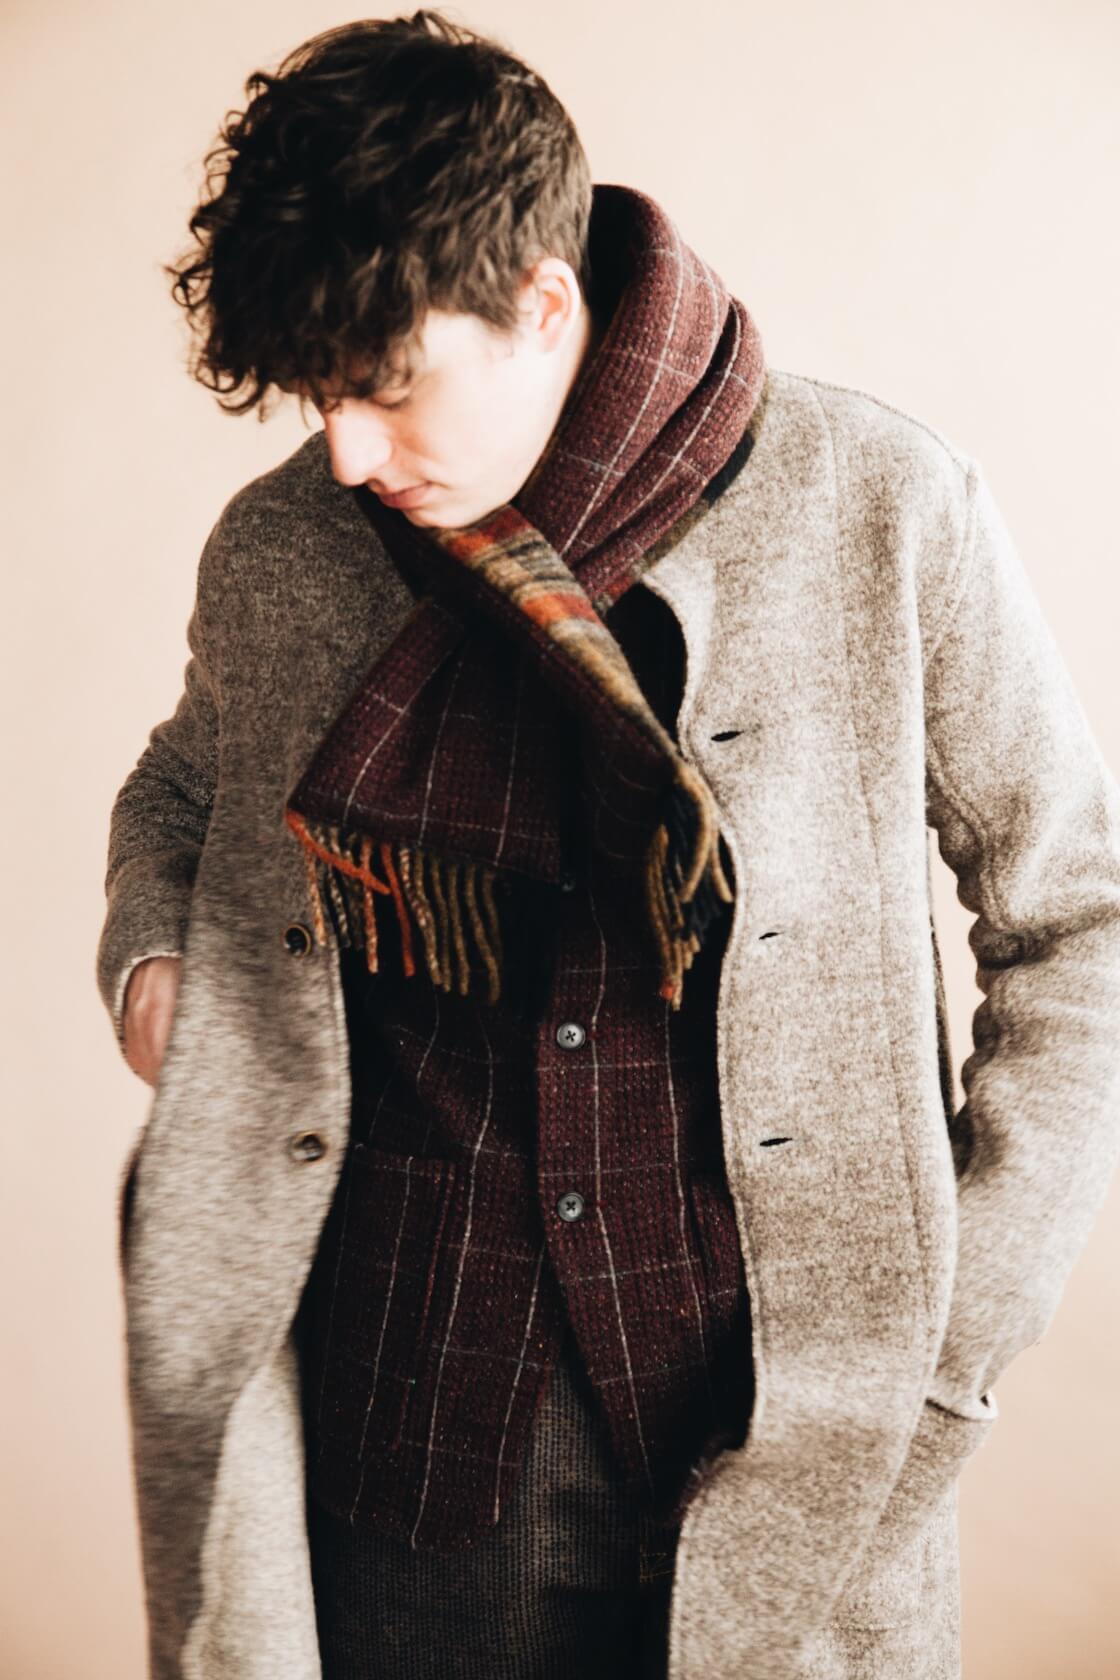 kapital tyrol wool nomad jacket, tweed fleecy knit kobe jacket, century denim pants, and country wool scarf on body